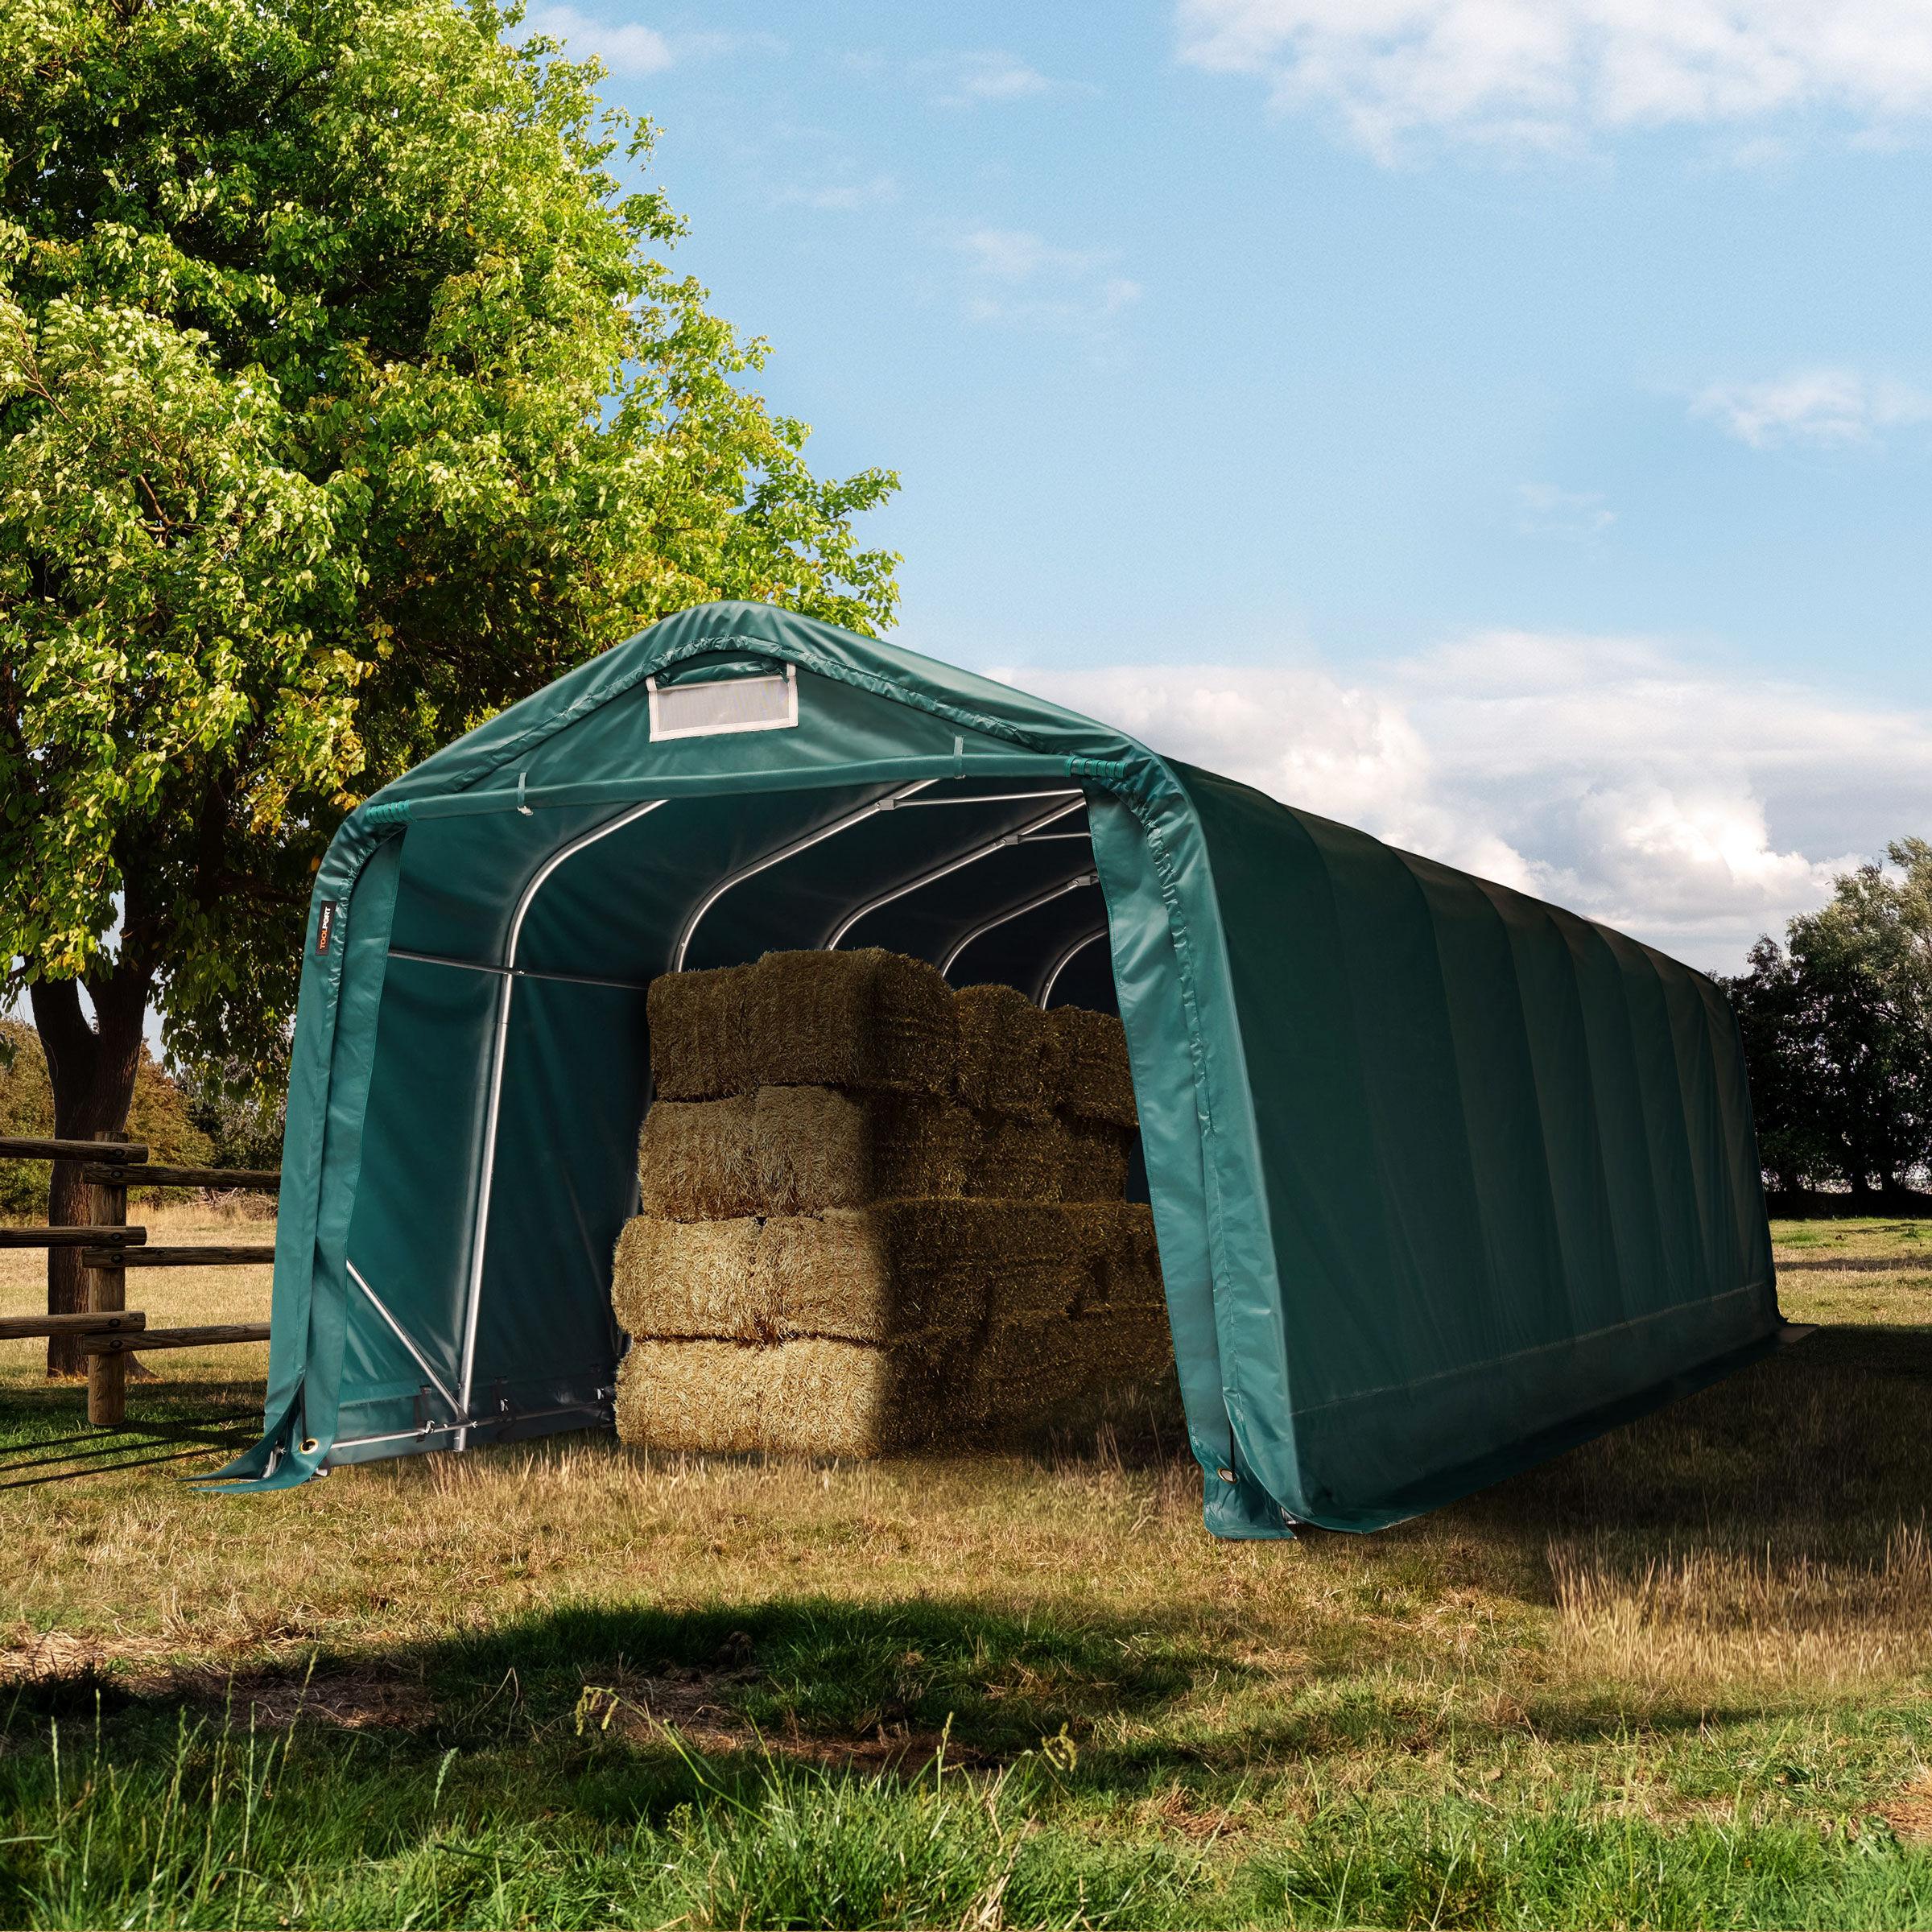 TOOLPORT Pasture tent 3,3x8,4m PVC 550 g/m² dark green waterproof